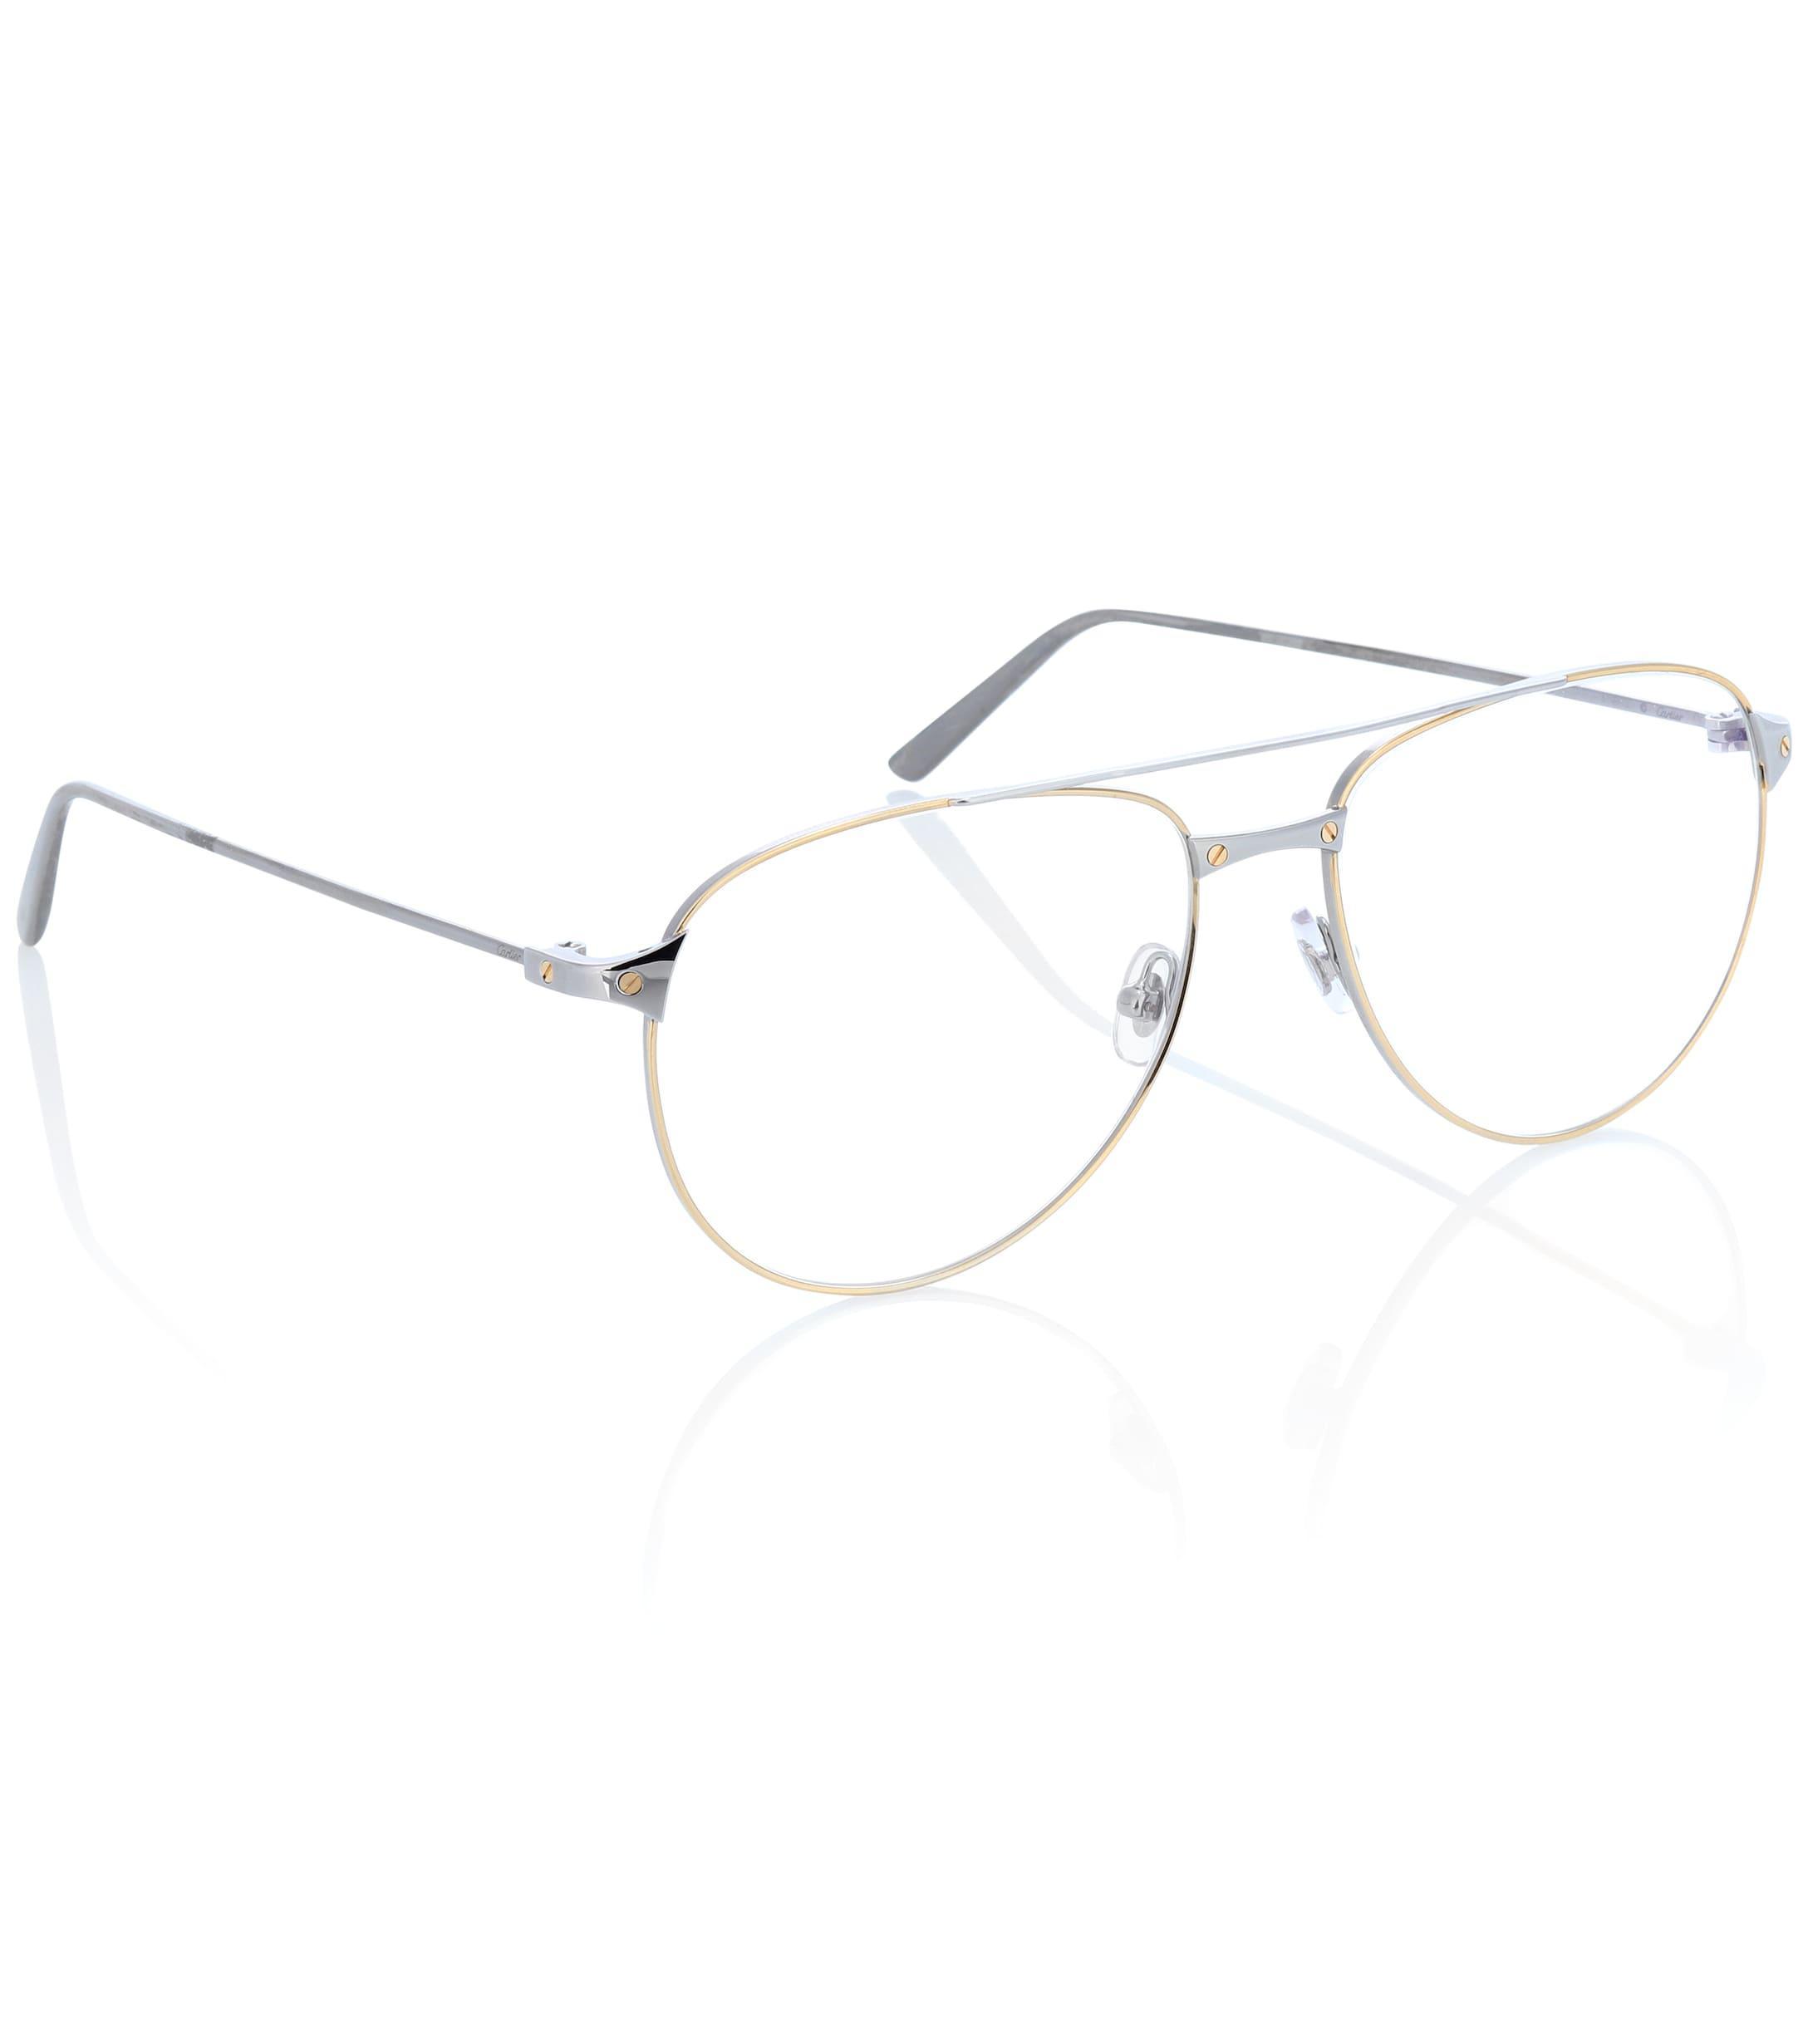 63f0e5201f Cartier - Metallic Santos De Cartier Aviator Glasses - Lyst. View fullscreen